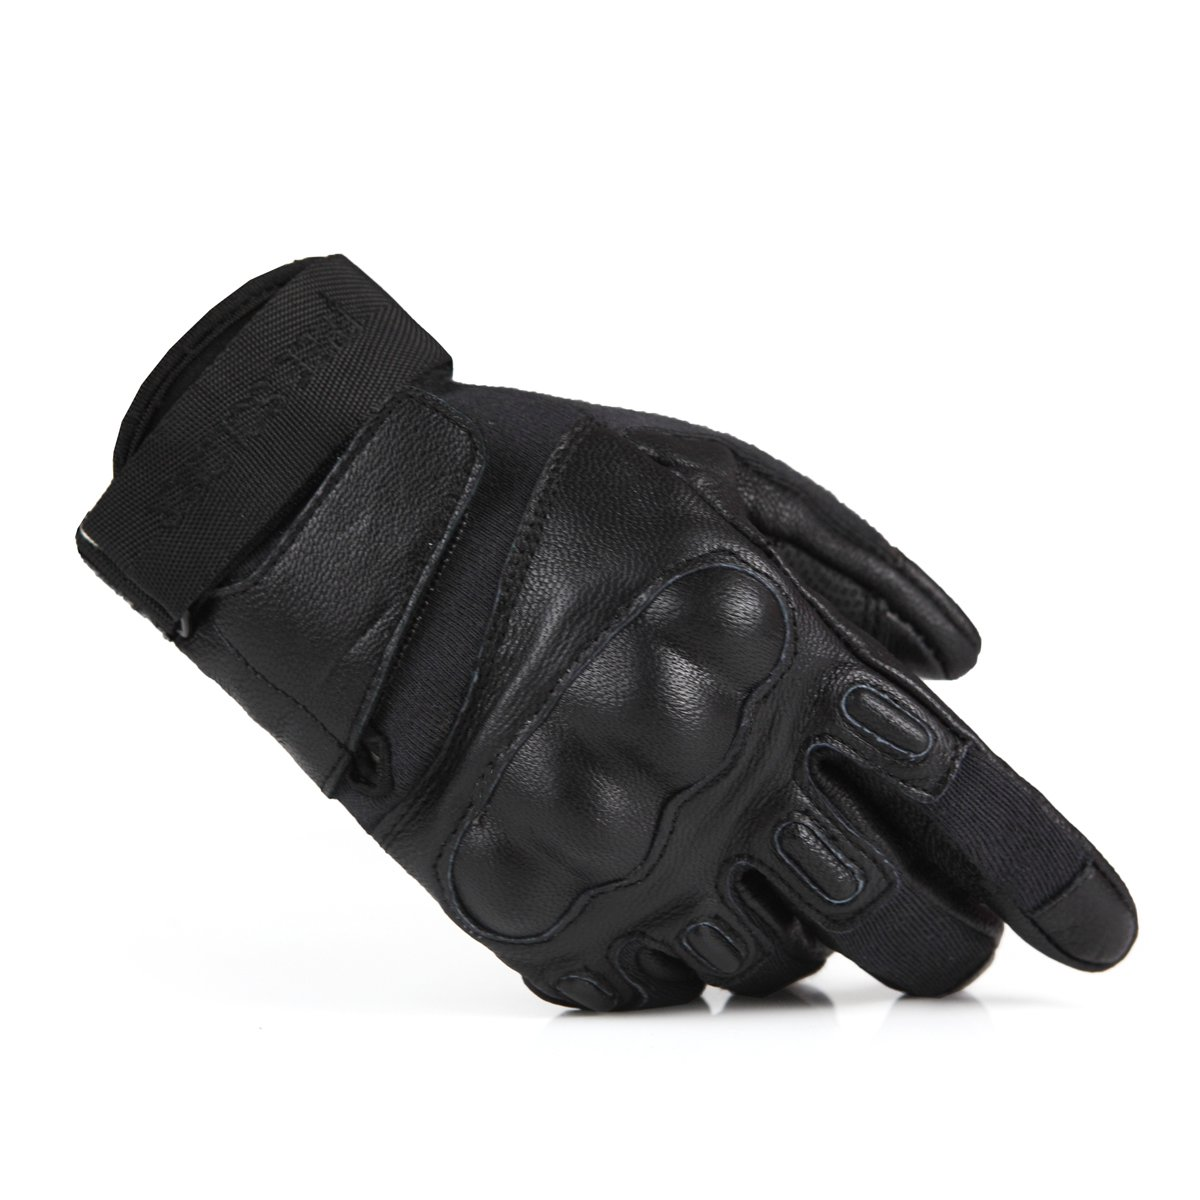 Leather work gloves china - Leather Armor Gloves Sheepskin Kevlar Scratch Resistant Fire Retardant Training Gloves China